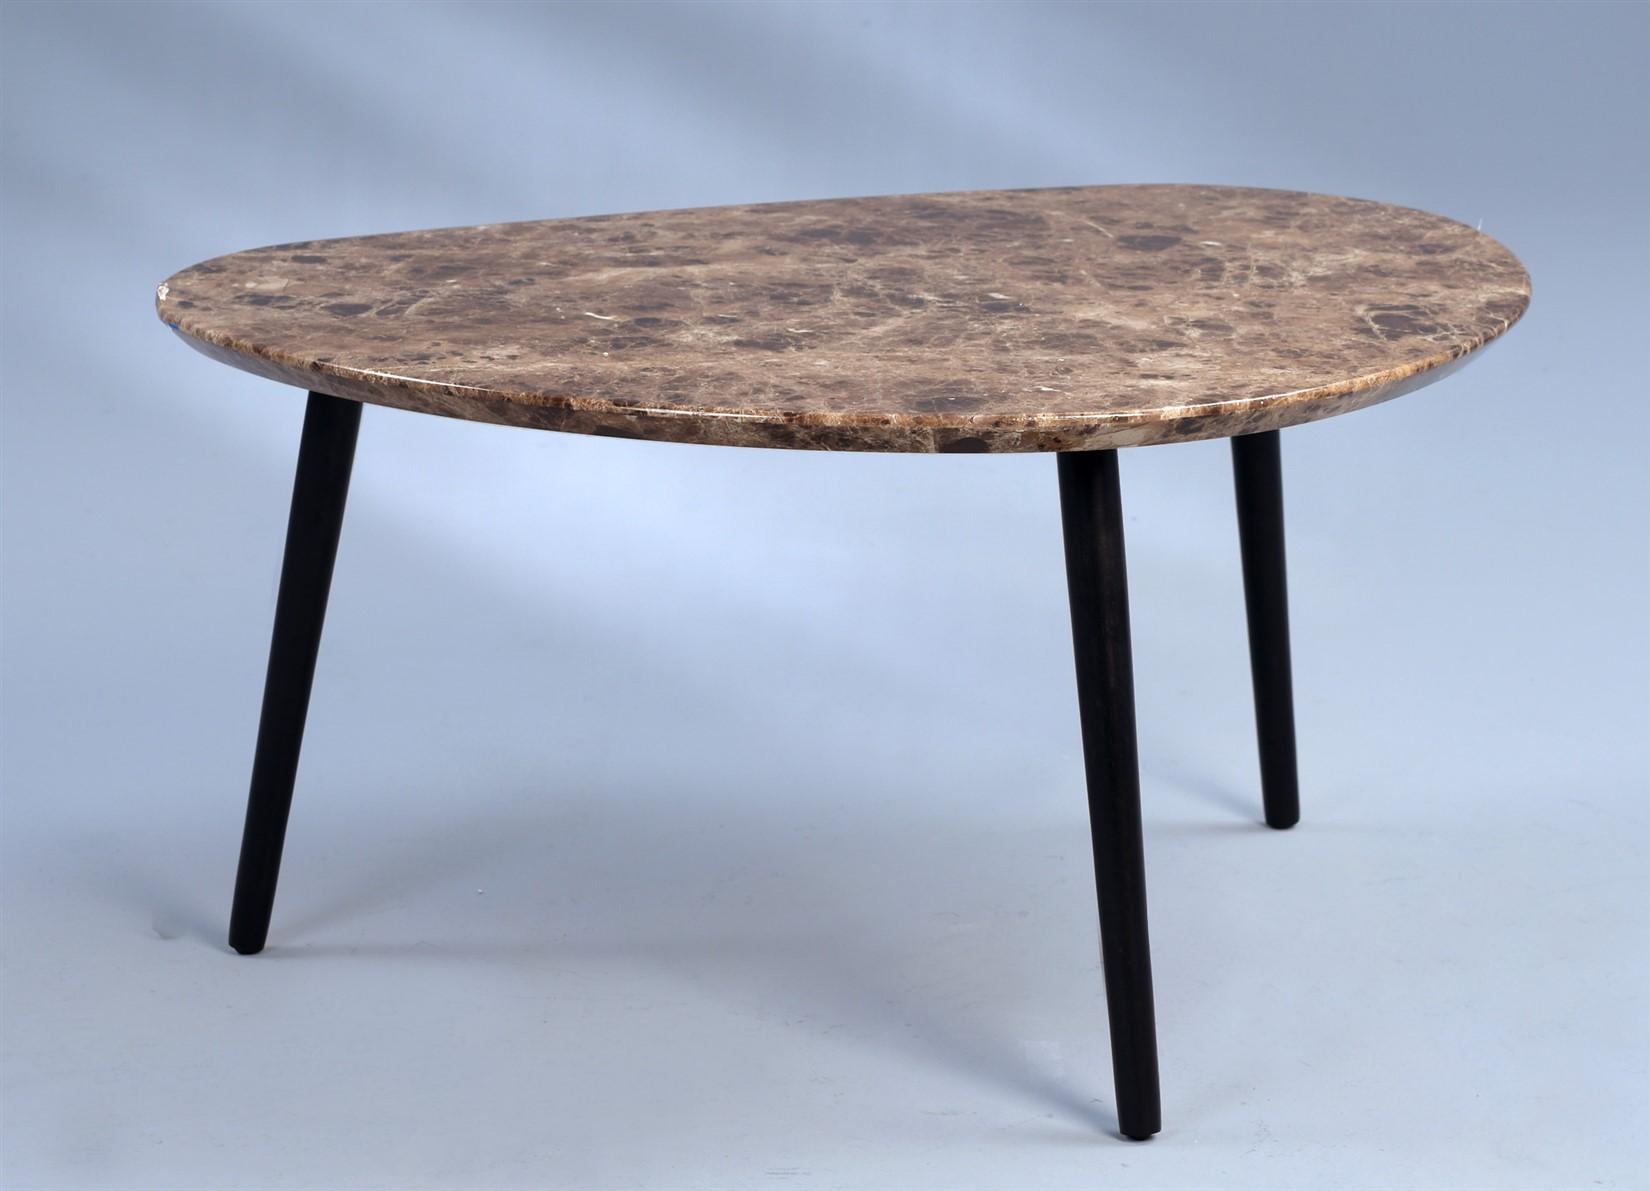 Couchtisch beistelltisch cindy 90x72 cm marmor dunkel for Marmor optik couchtisch